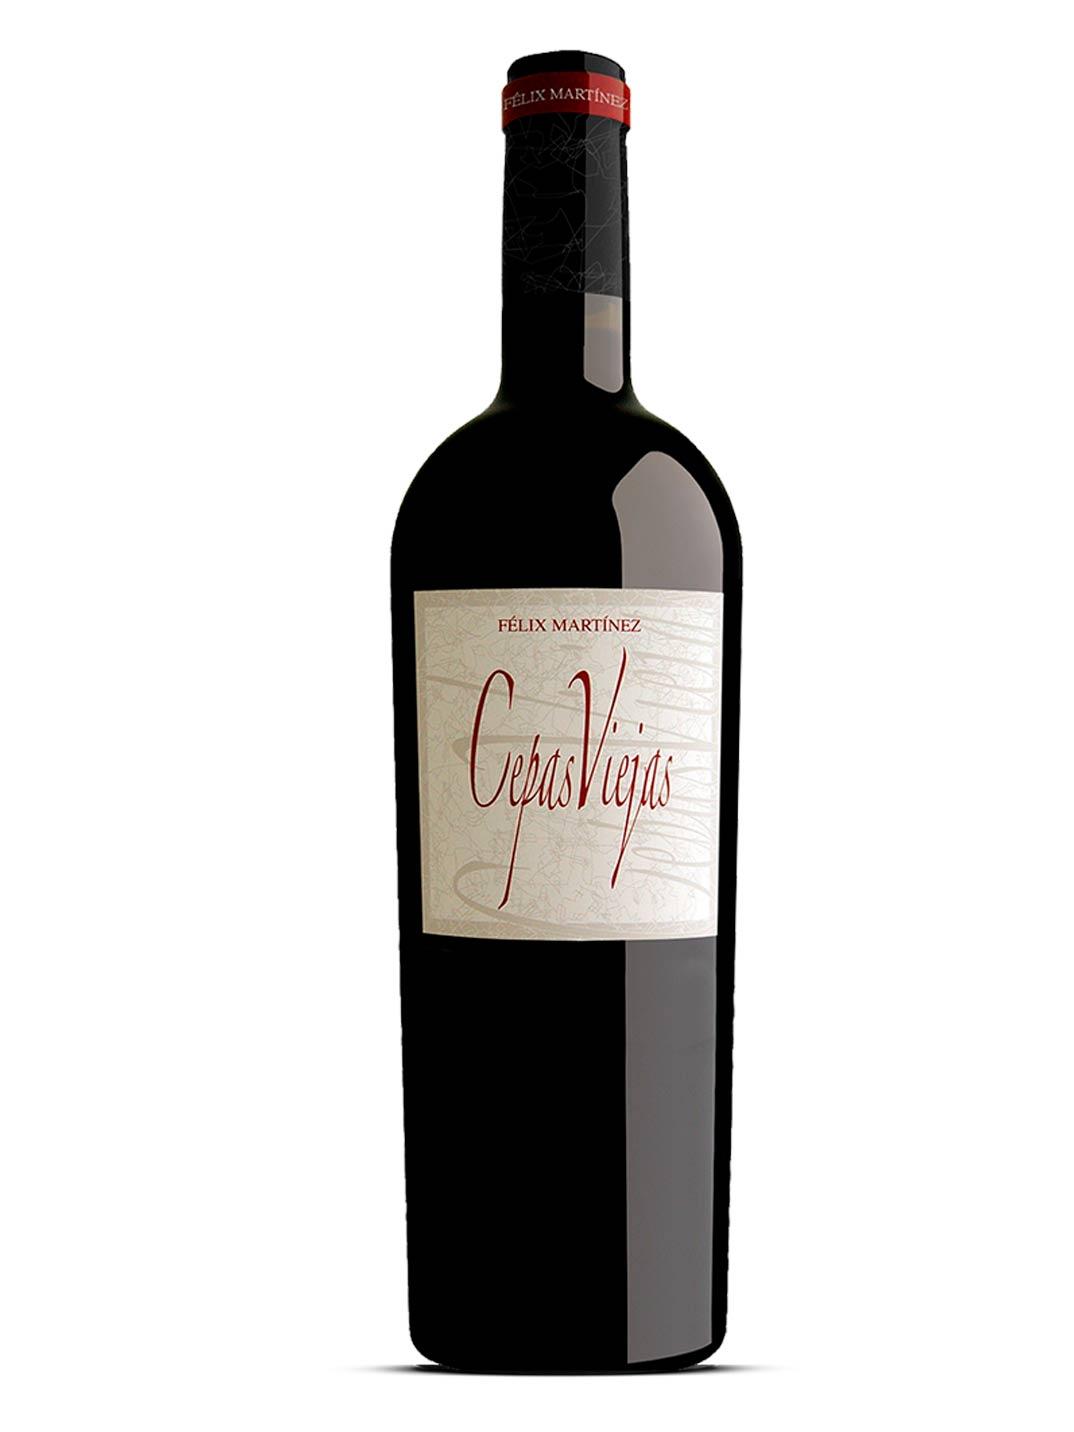 vinos-jeromin-felix-martinez-cepas-viejas